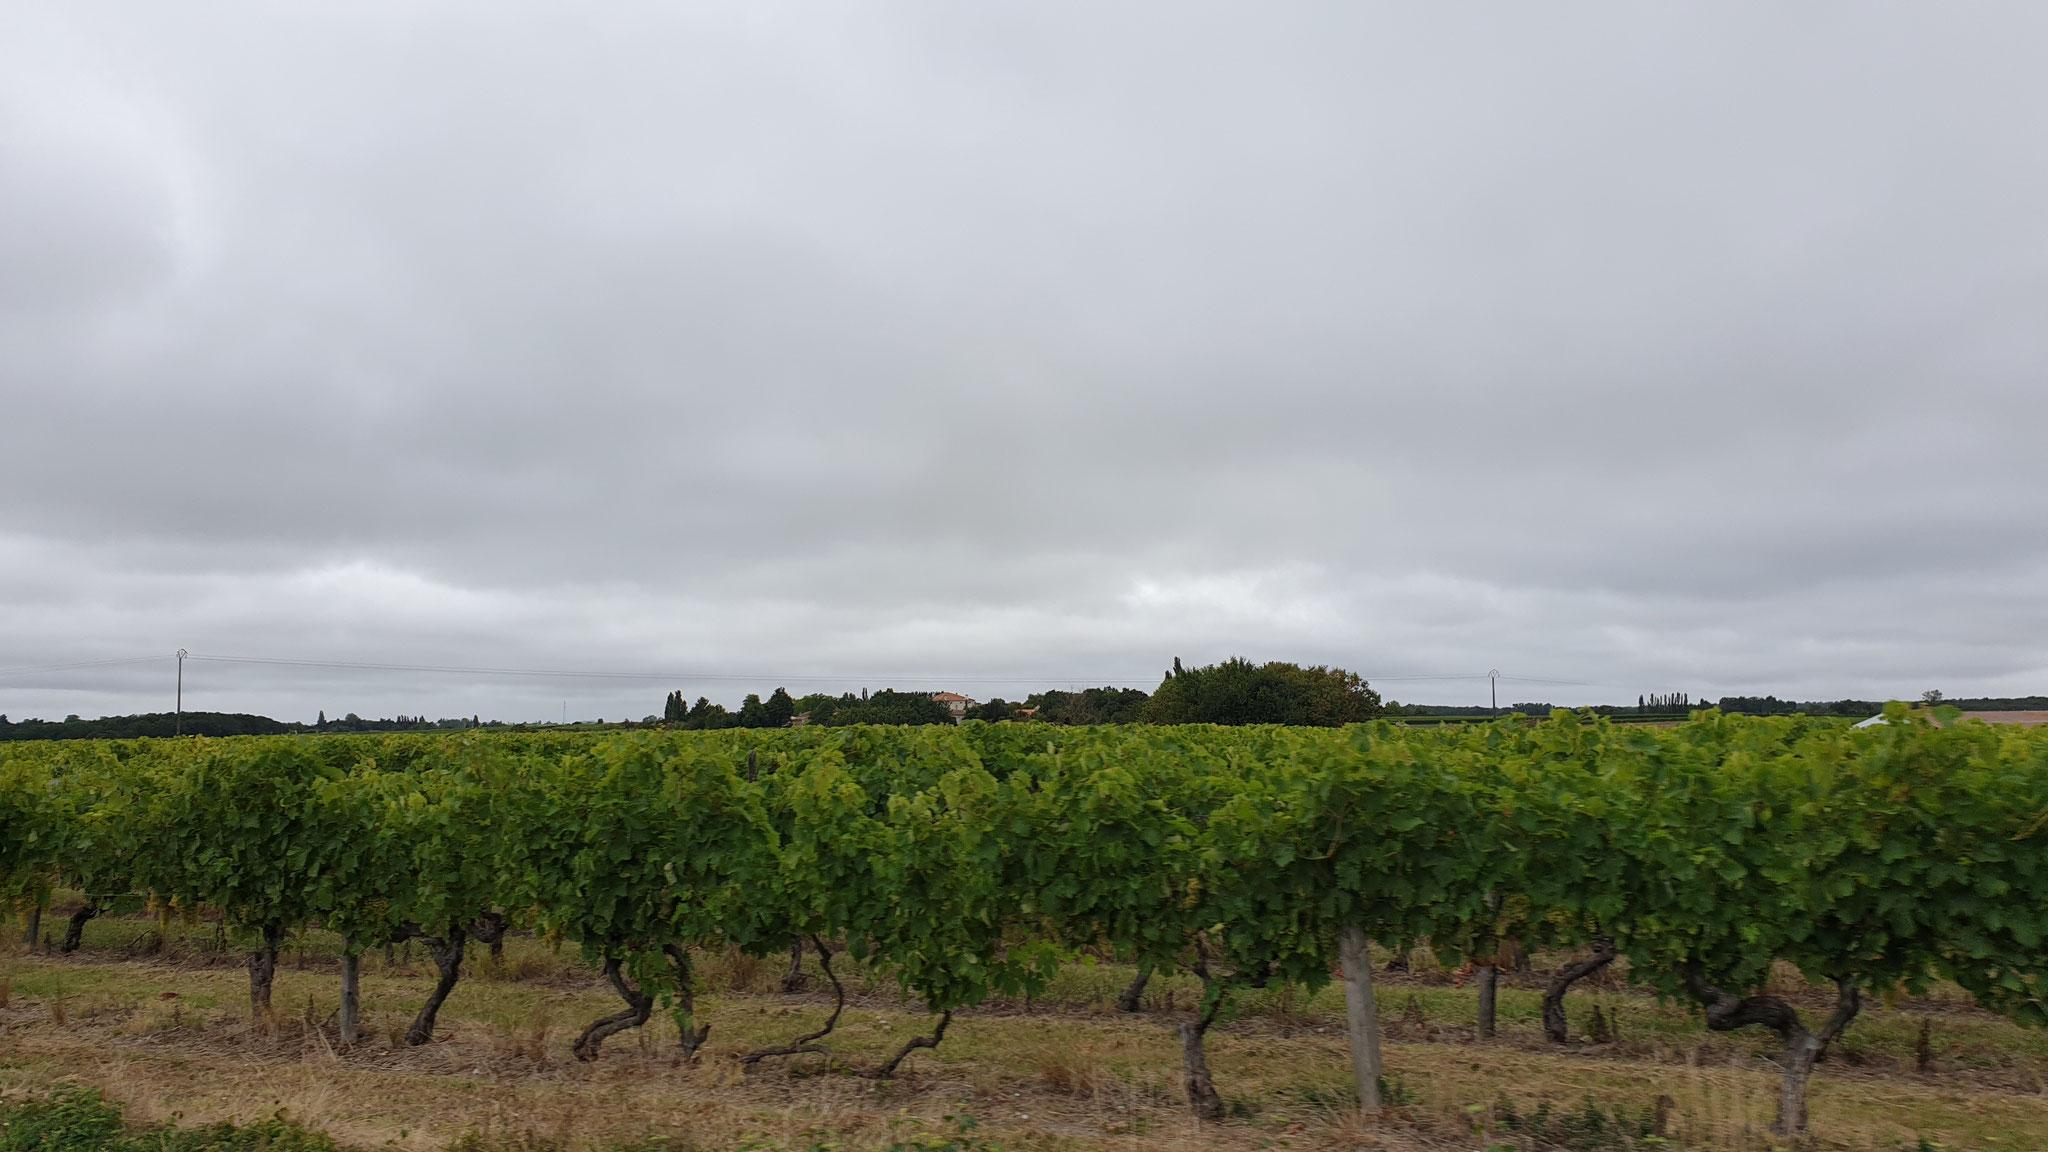 Die ersten Bordeaux-Reben